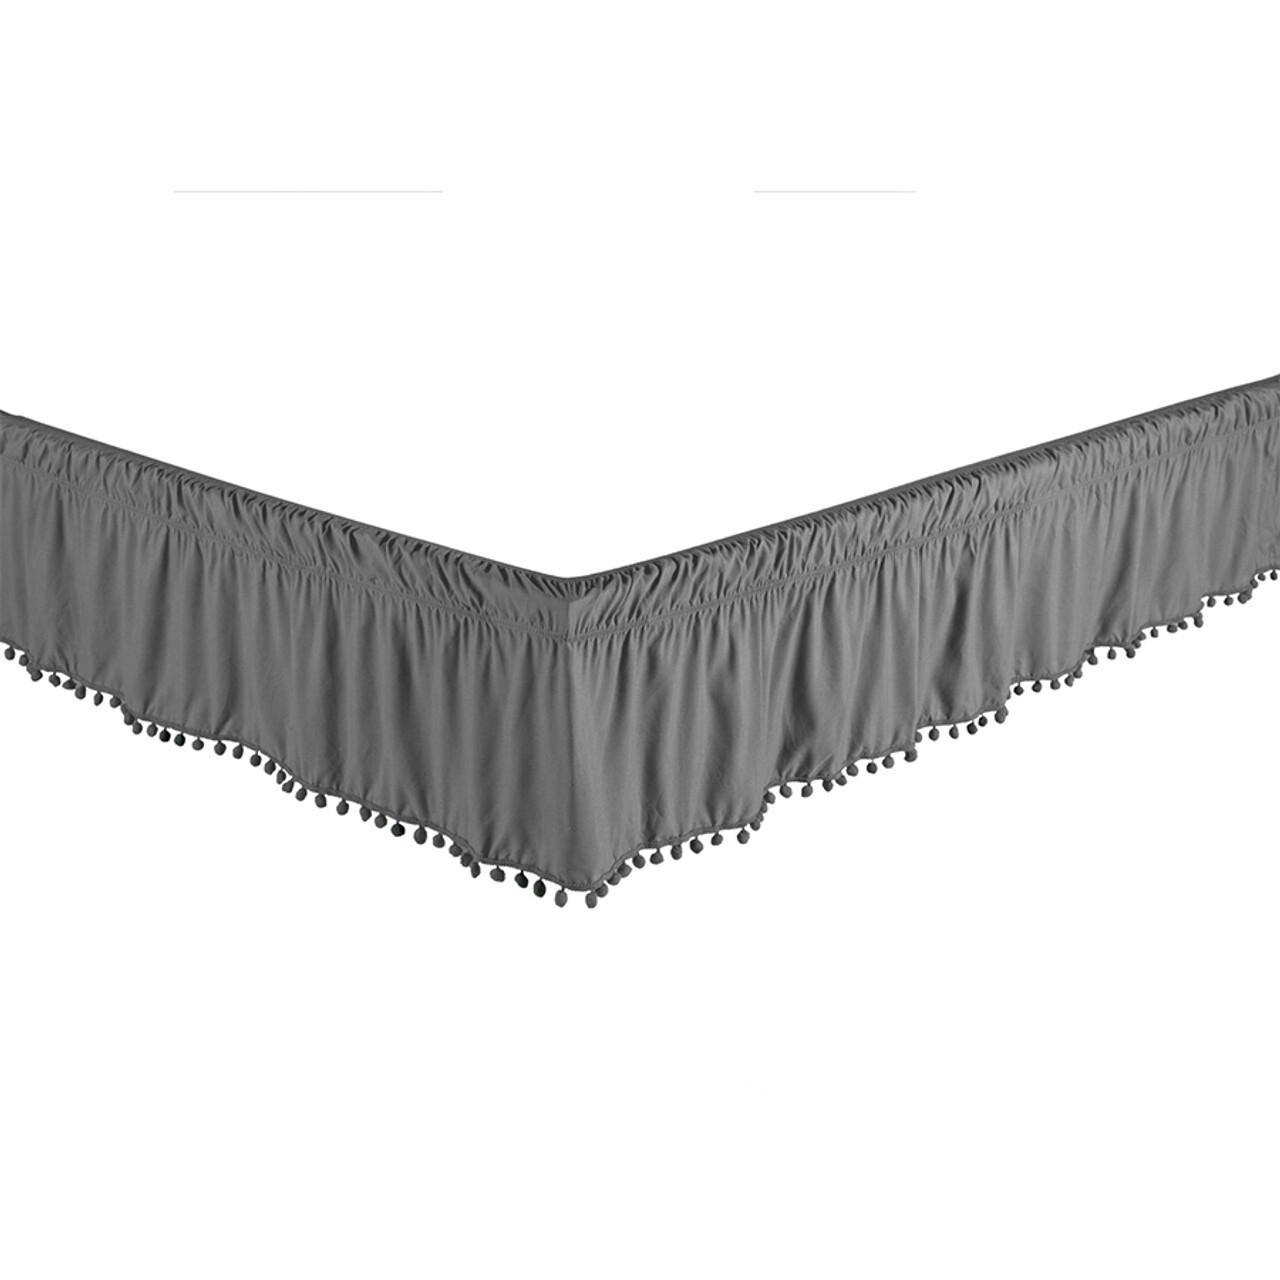 "Grey Bed Skirt Dust Ruffle with Pom-Pom Fringe 100% Brushed Microfiber with 14"" Drop in USA, California, New York, New York City, Los Angeles, San Francisco, Pennsylvania, Washington DC, Virginia, Maryland"